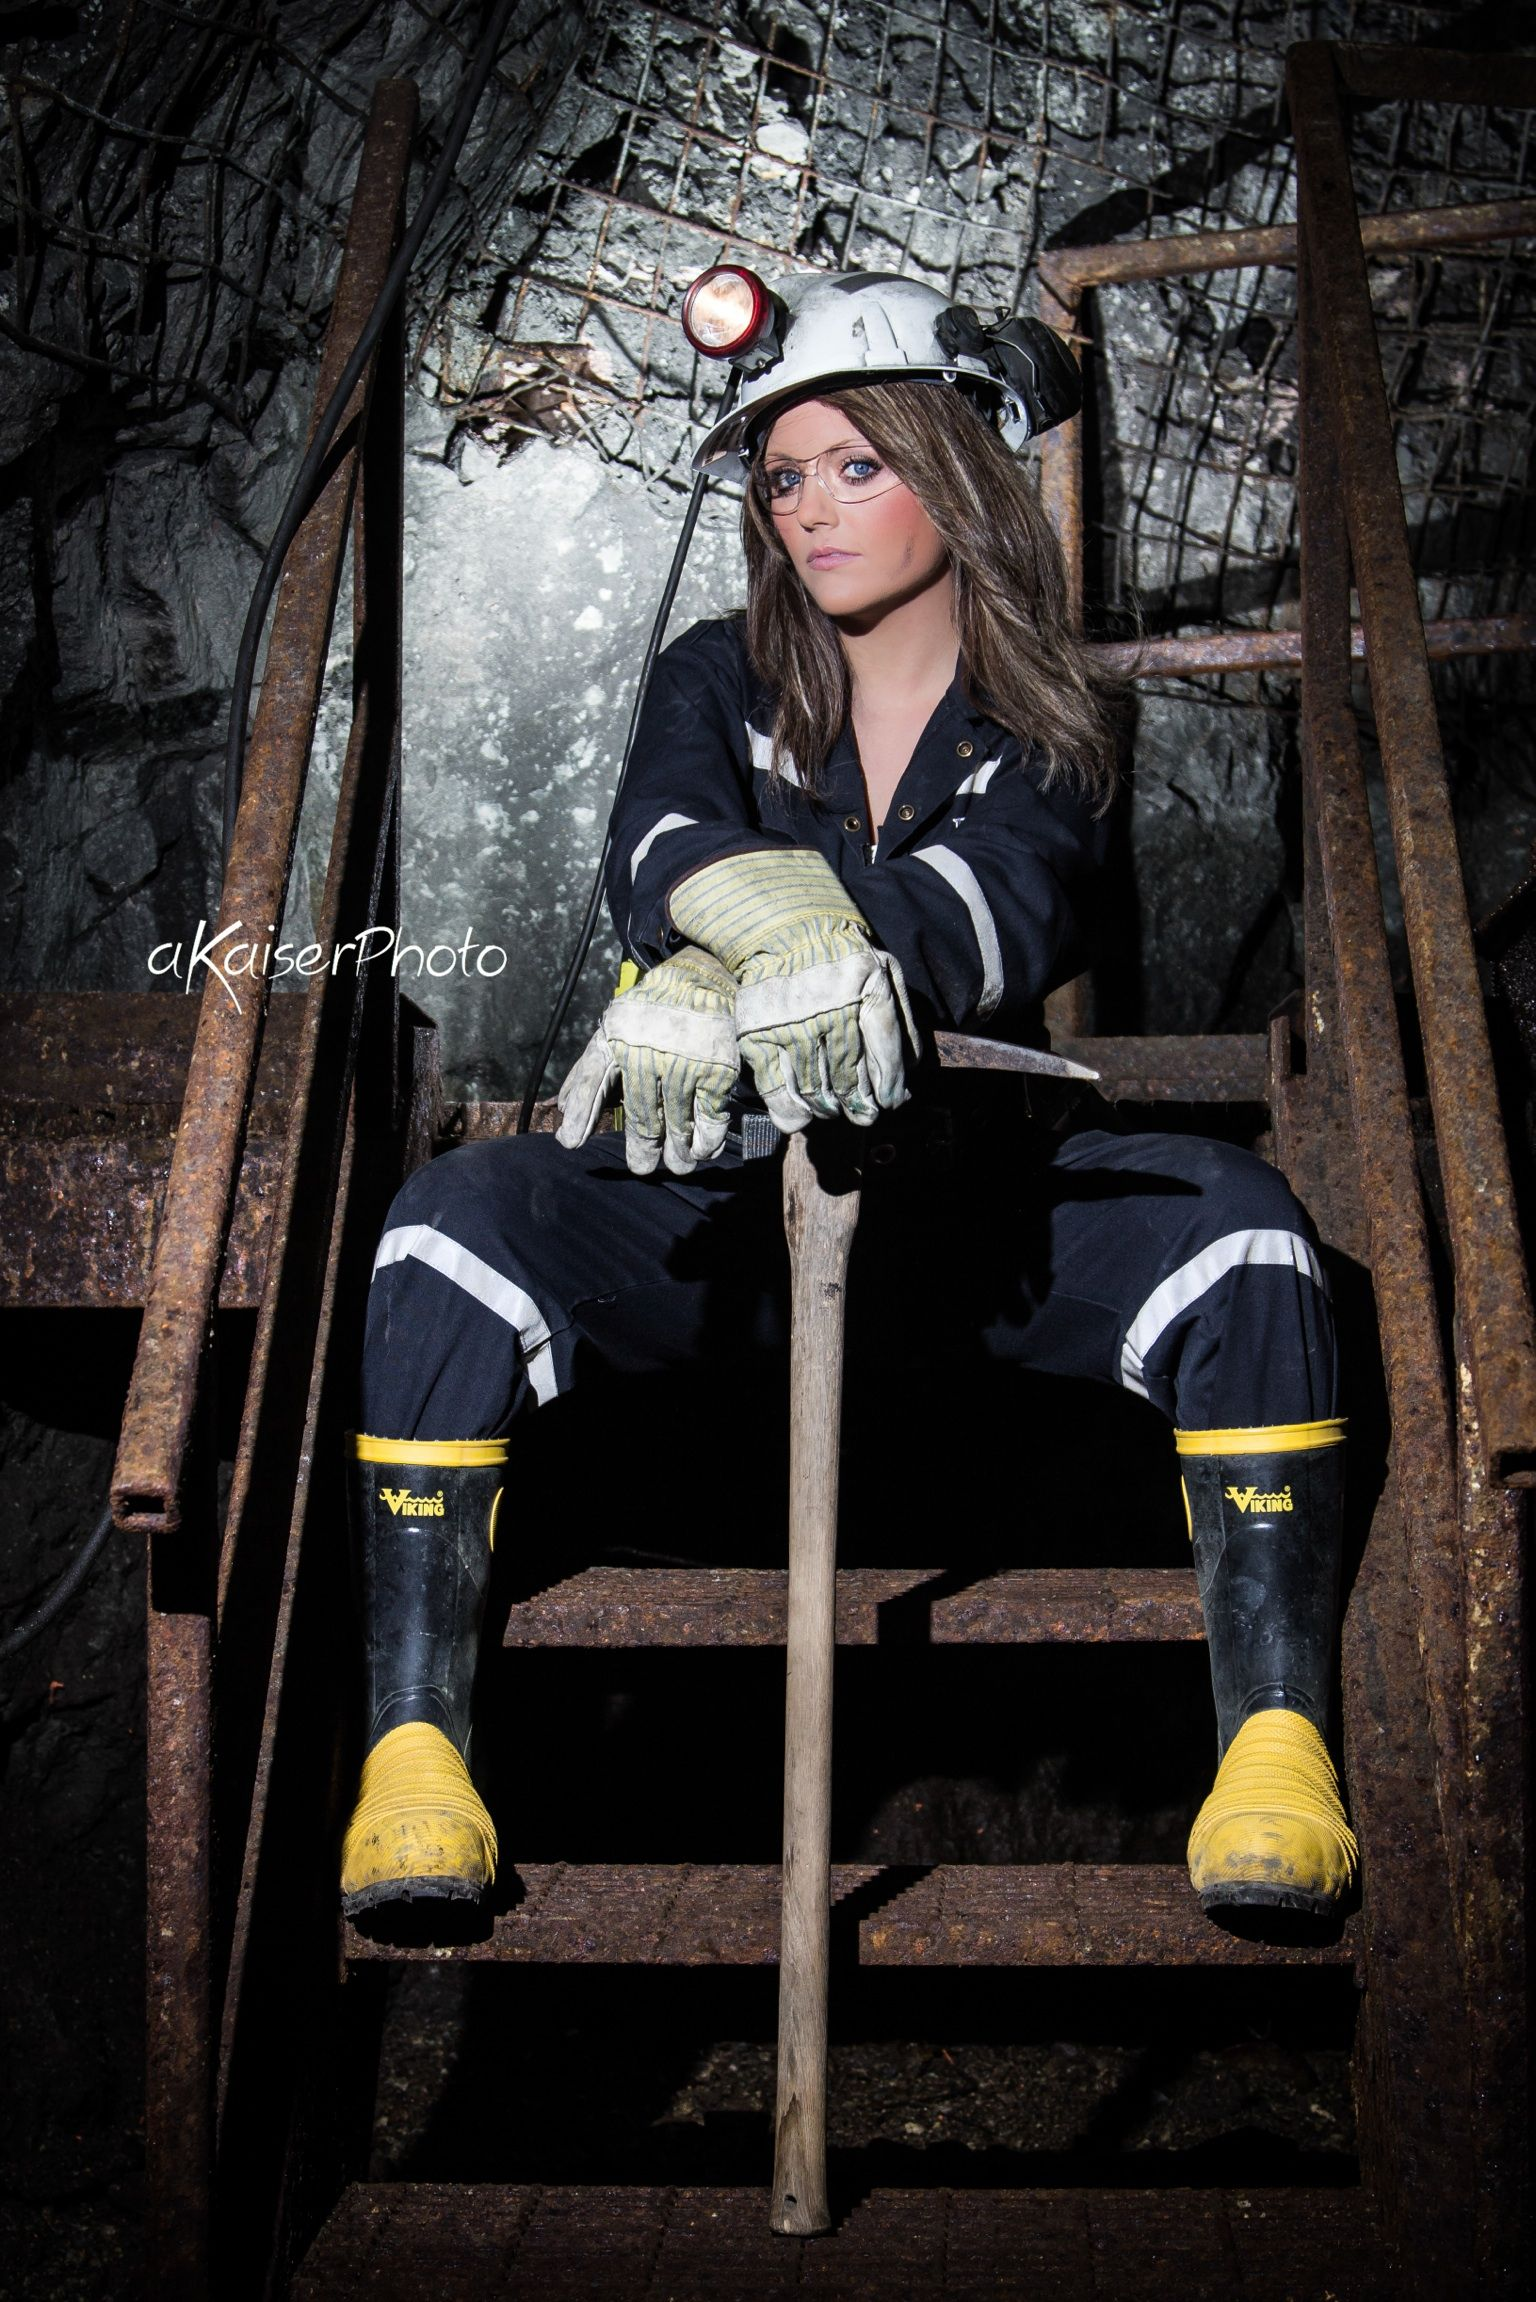 Underground Mining meets Modelling. **This photo was taken